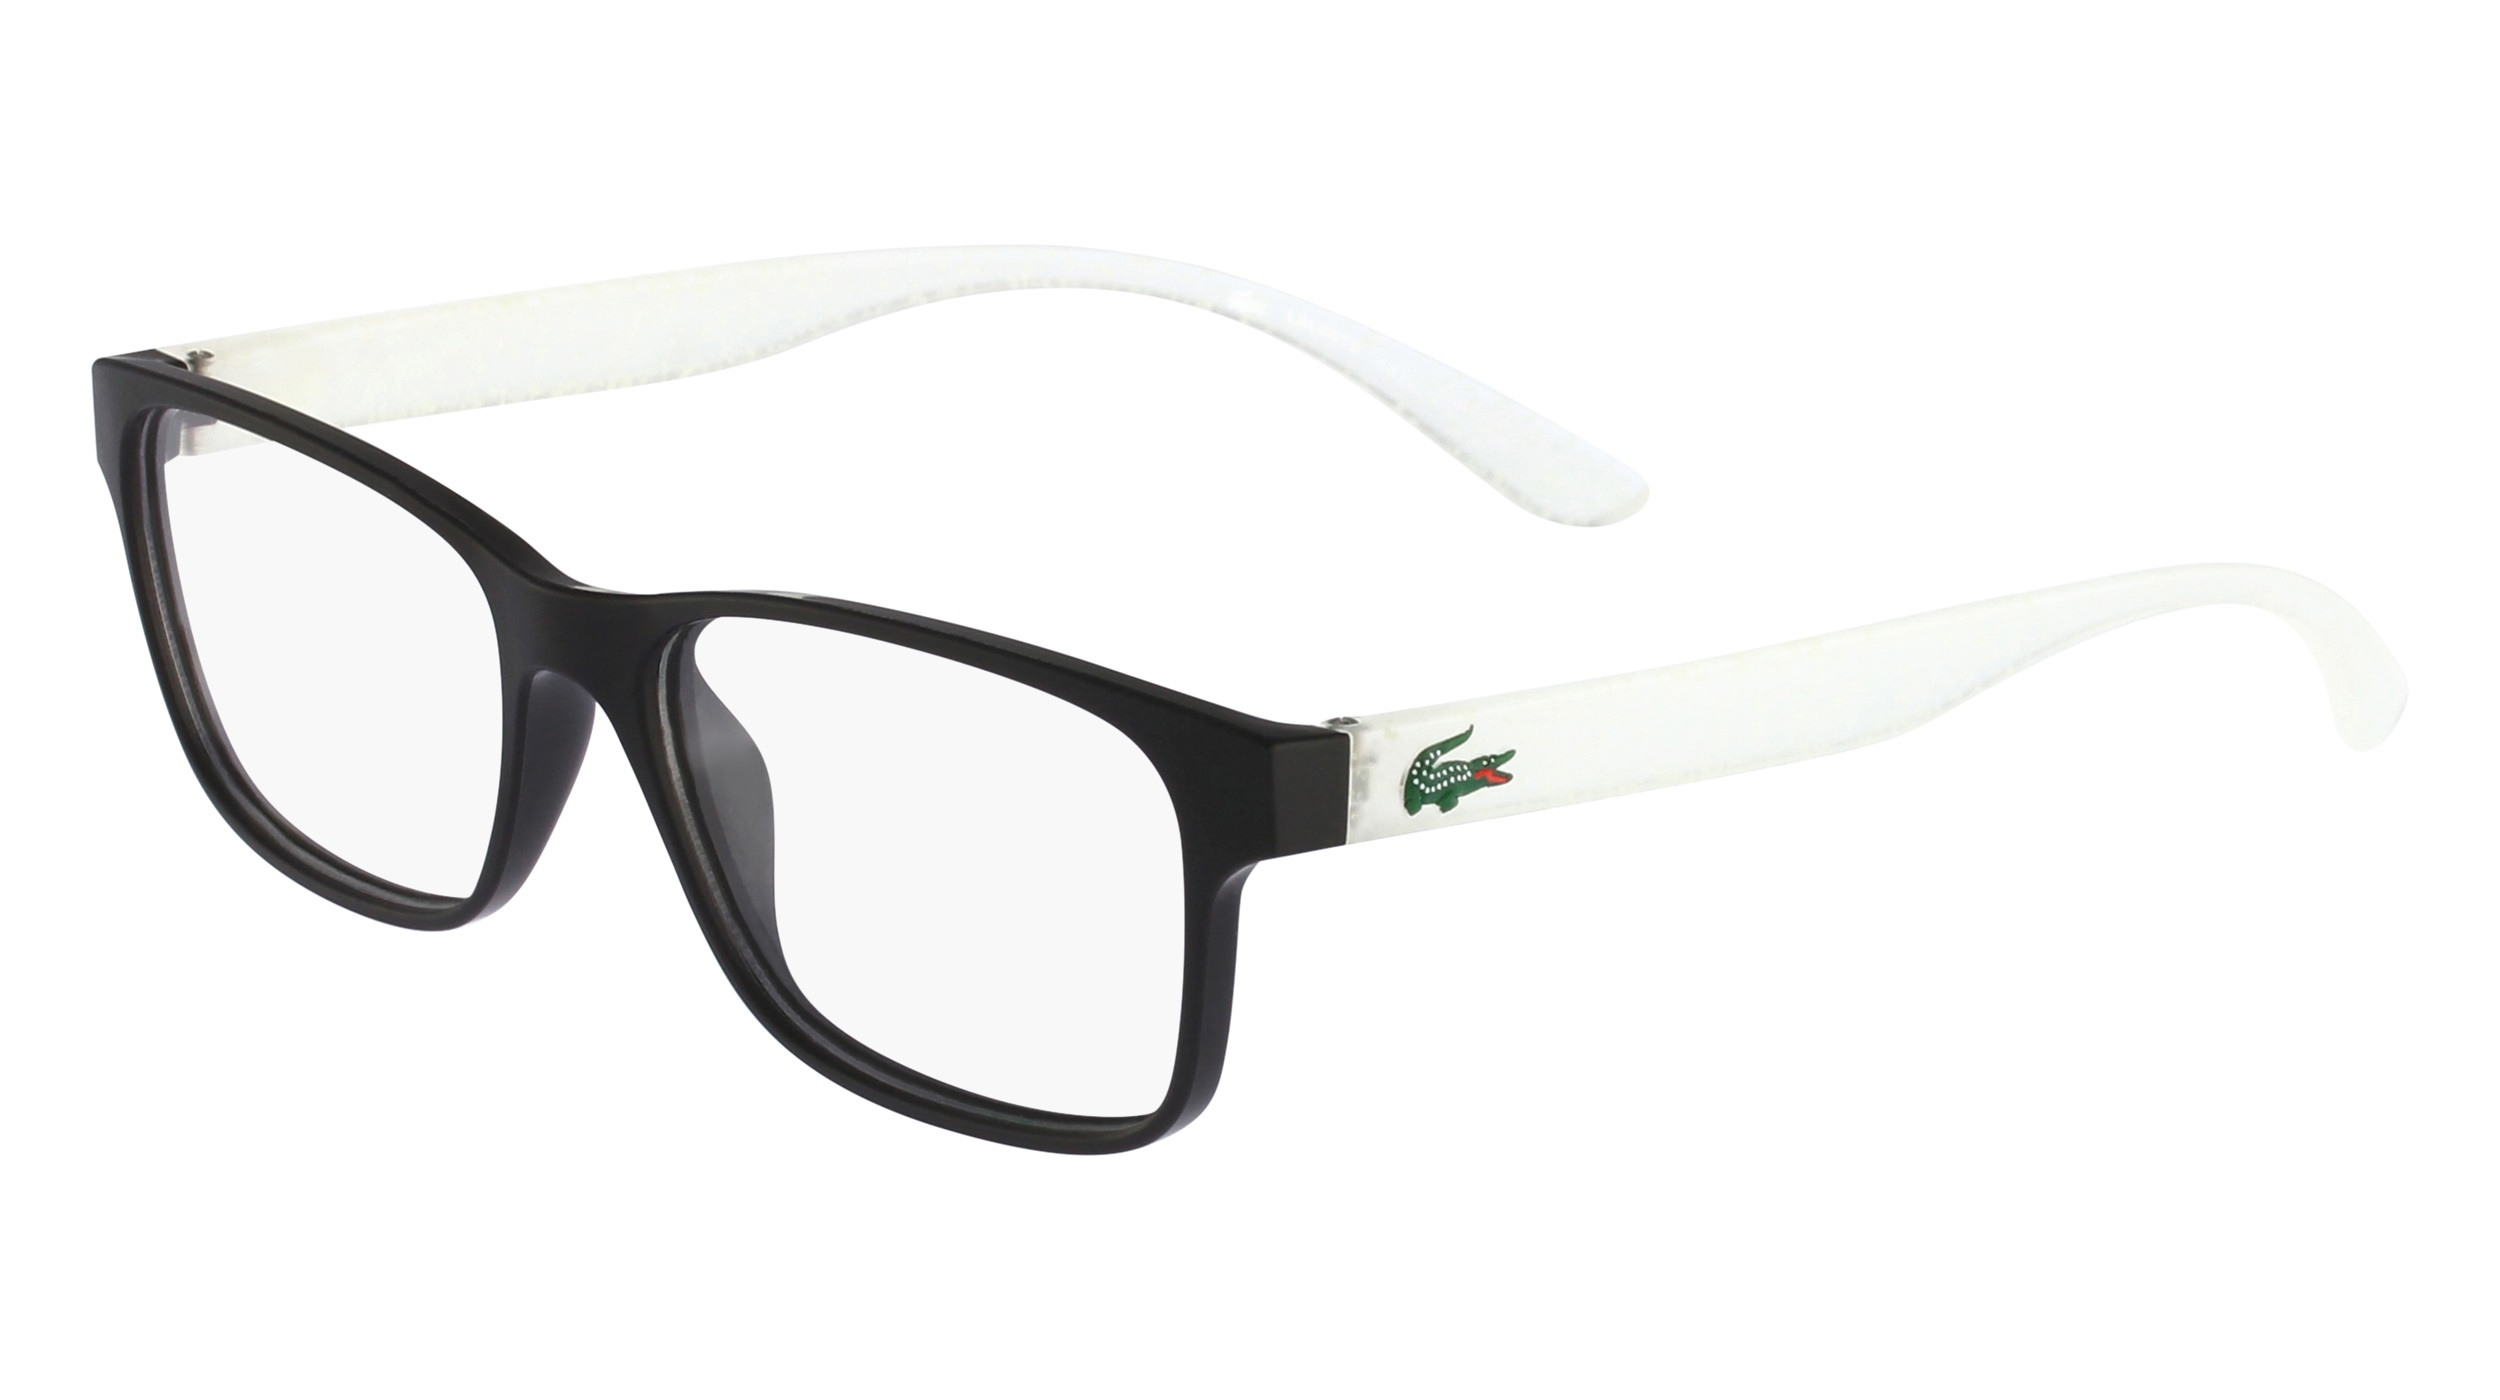 189b63c1c9 Prescription Eye Glasses